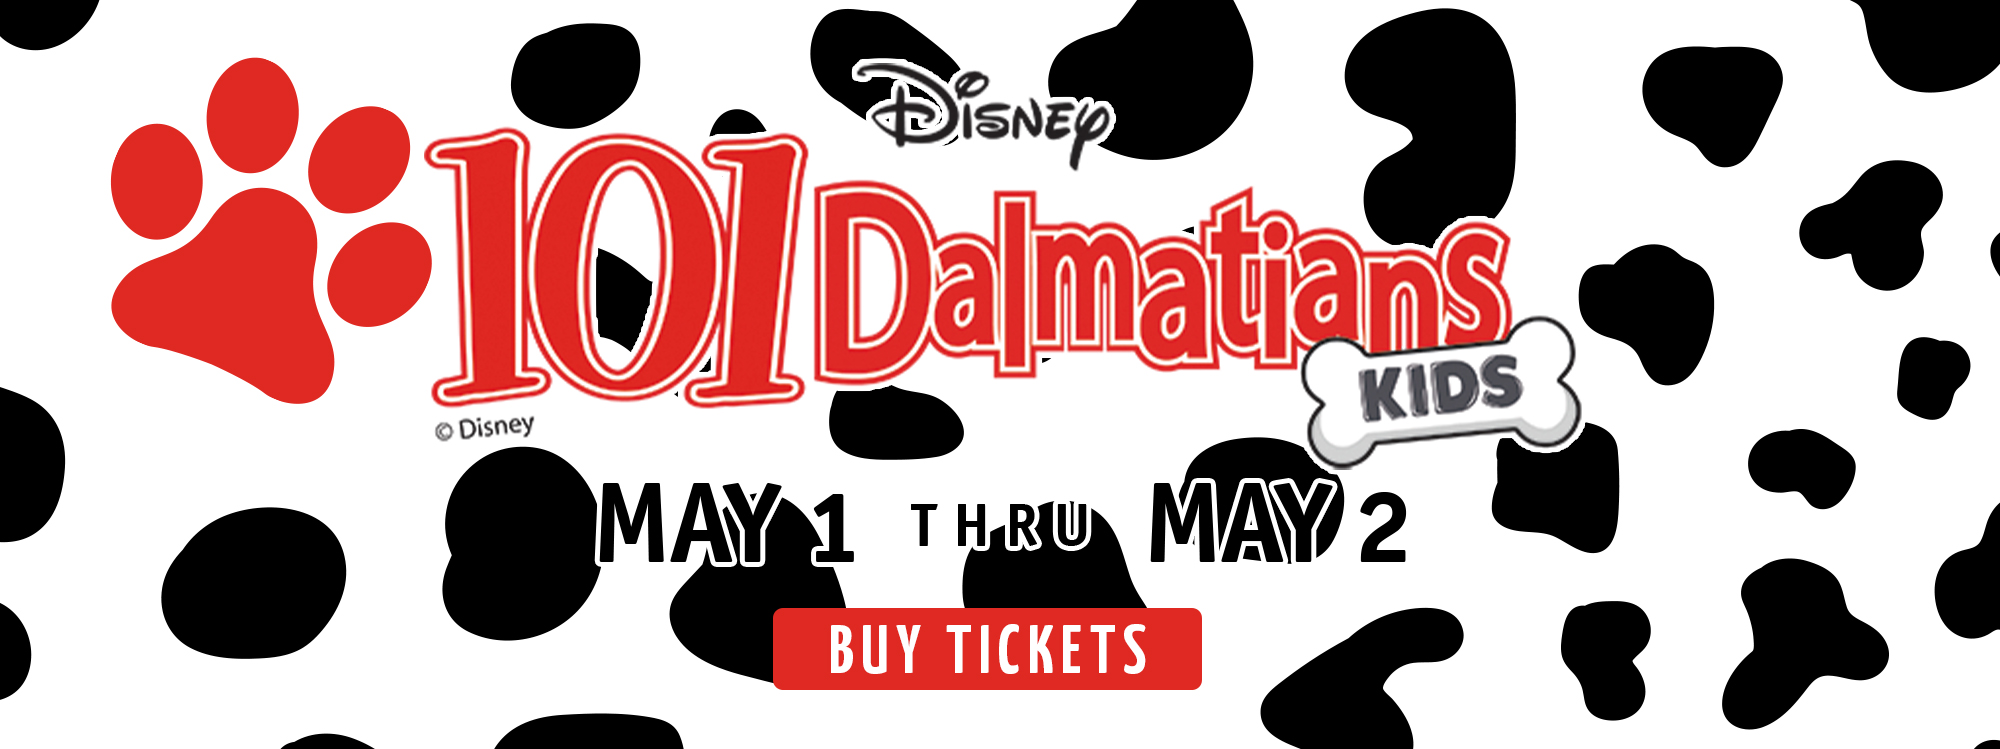 101 Dalmatians KIDS